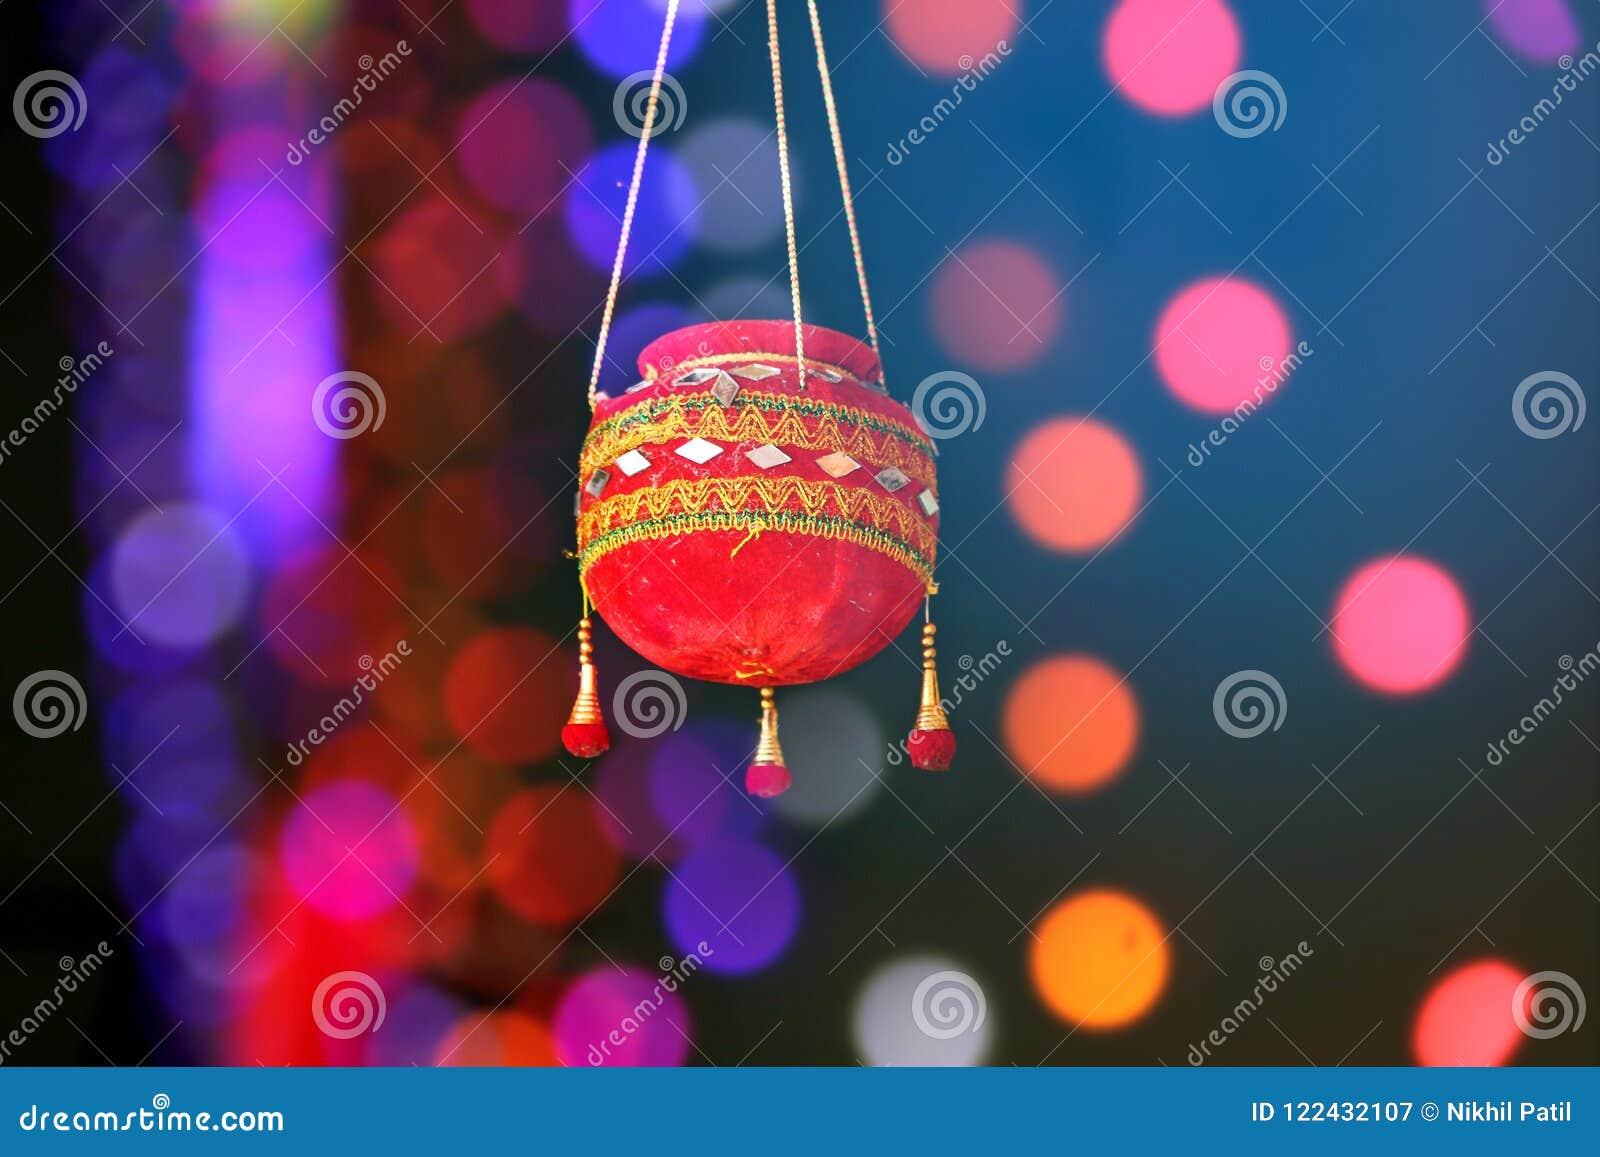 Fotografie des Dahis HANDI auf gokulashtami Festival in Indien, das Lord Shri Krishna-` s Geburtstag ist